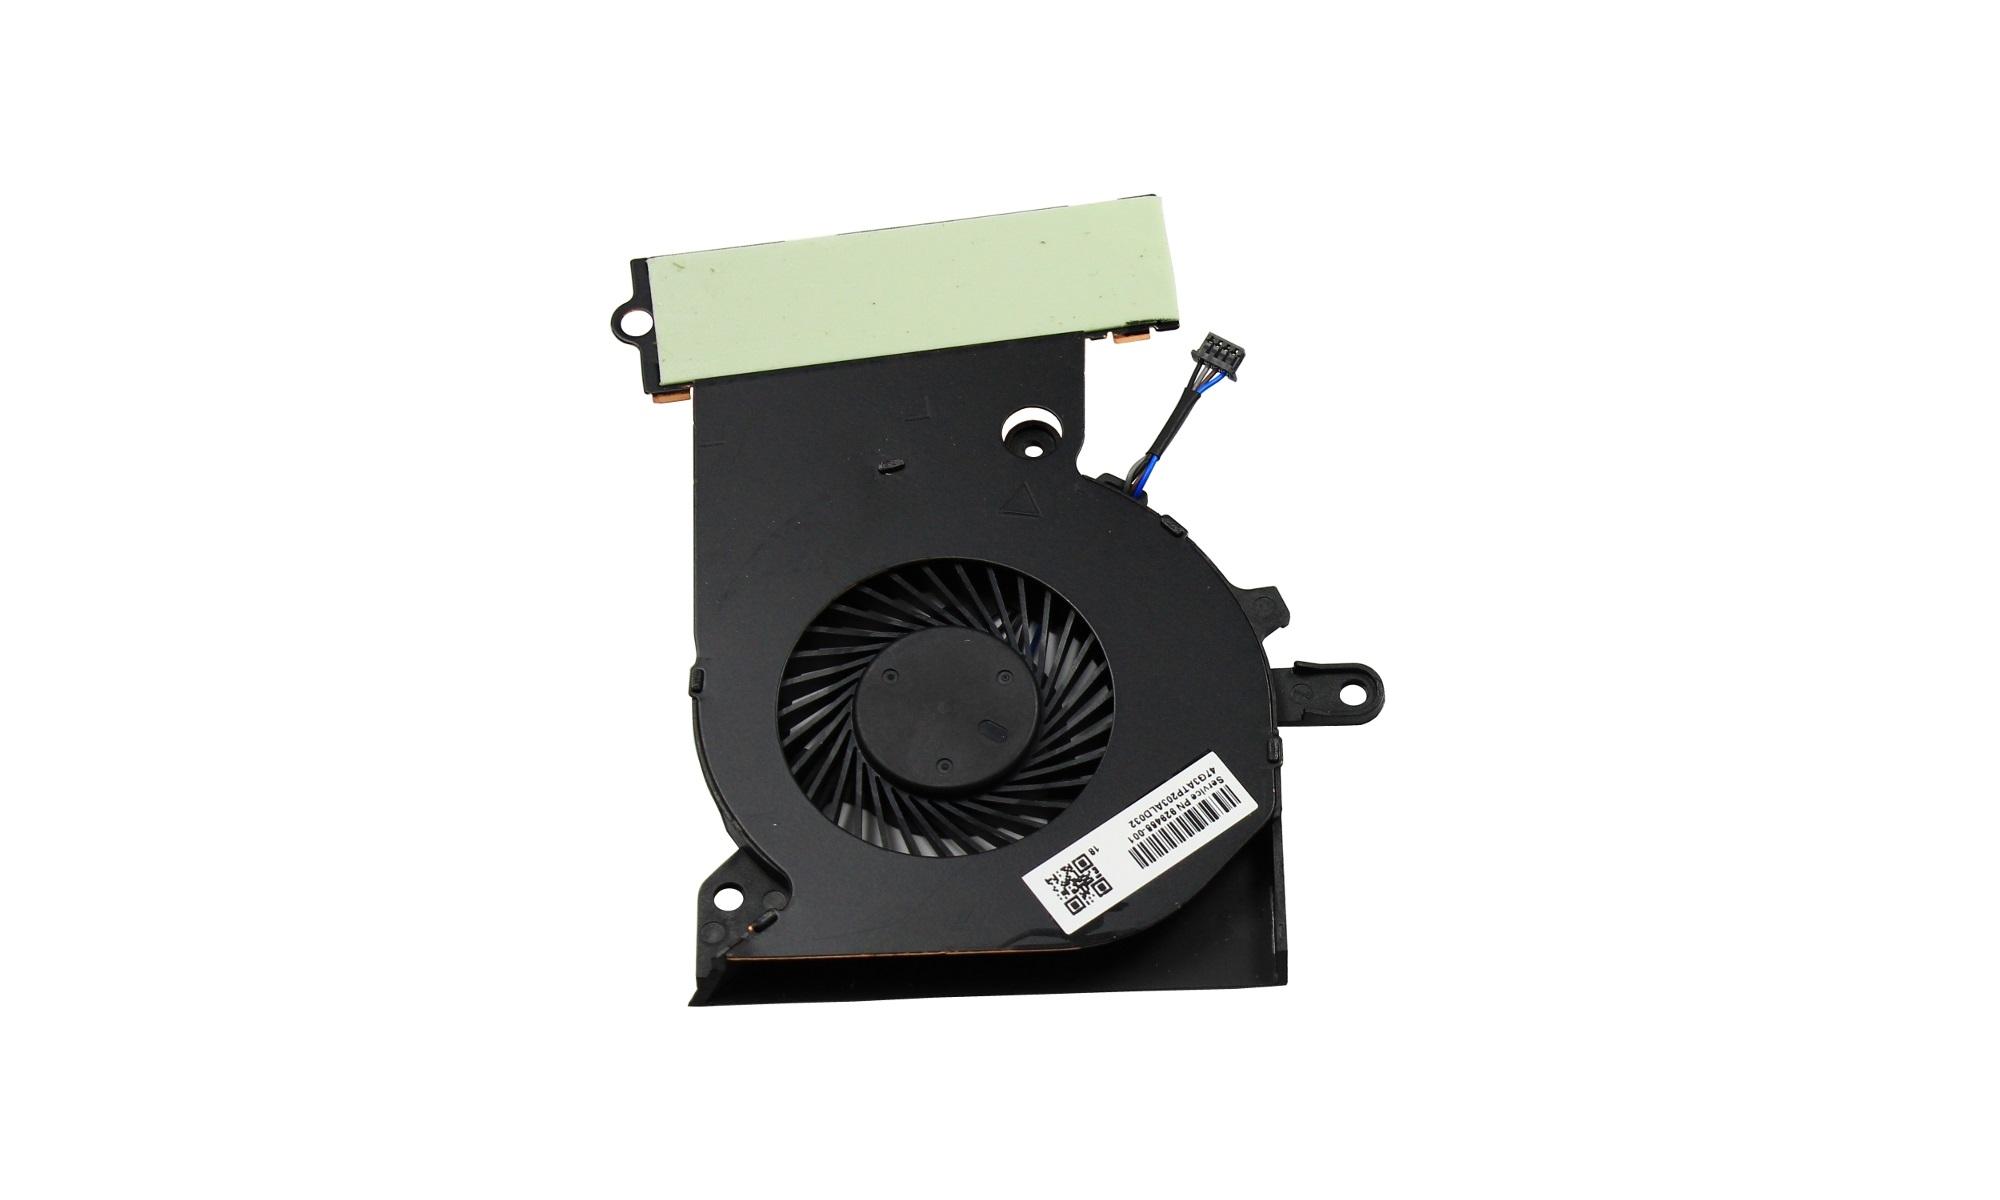 Cooler original stanga HP Omen 15-CE, NS75B00-16M02, model 929455-001